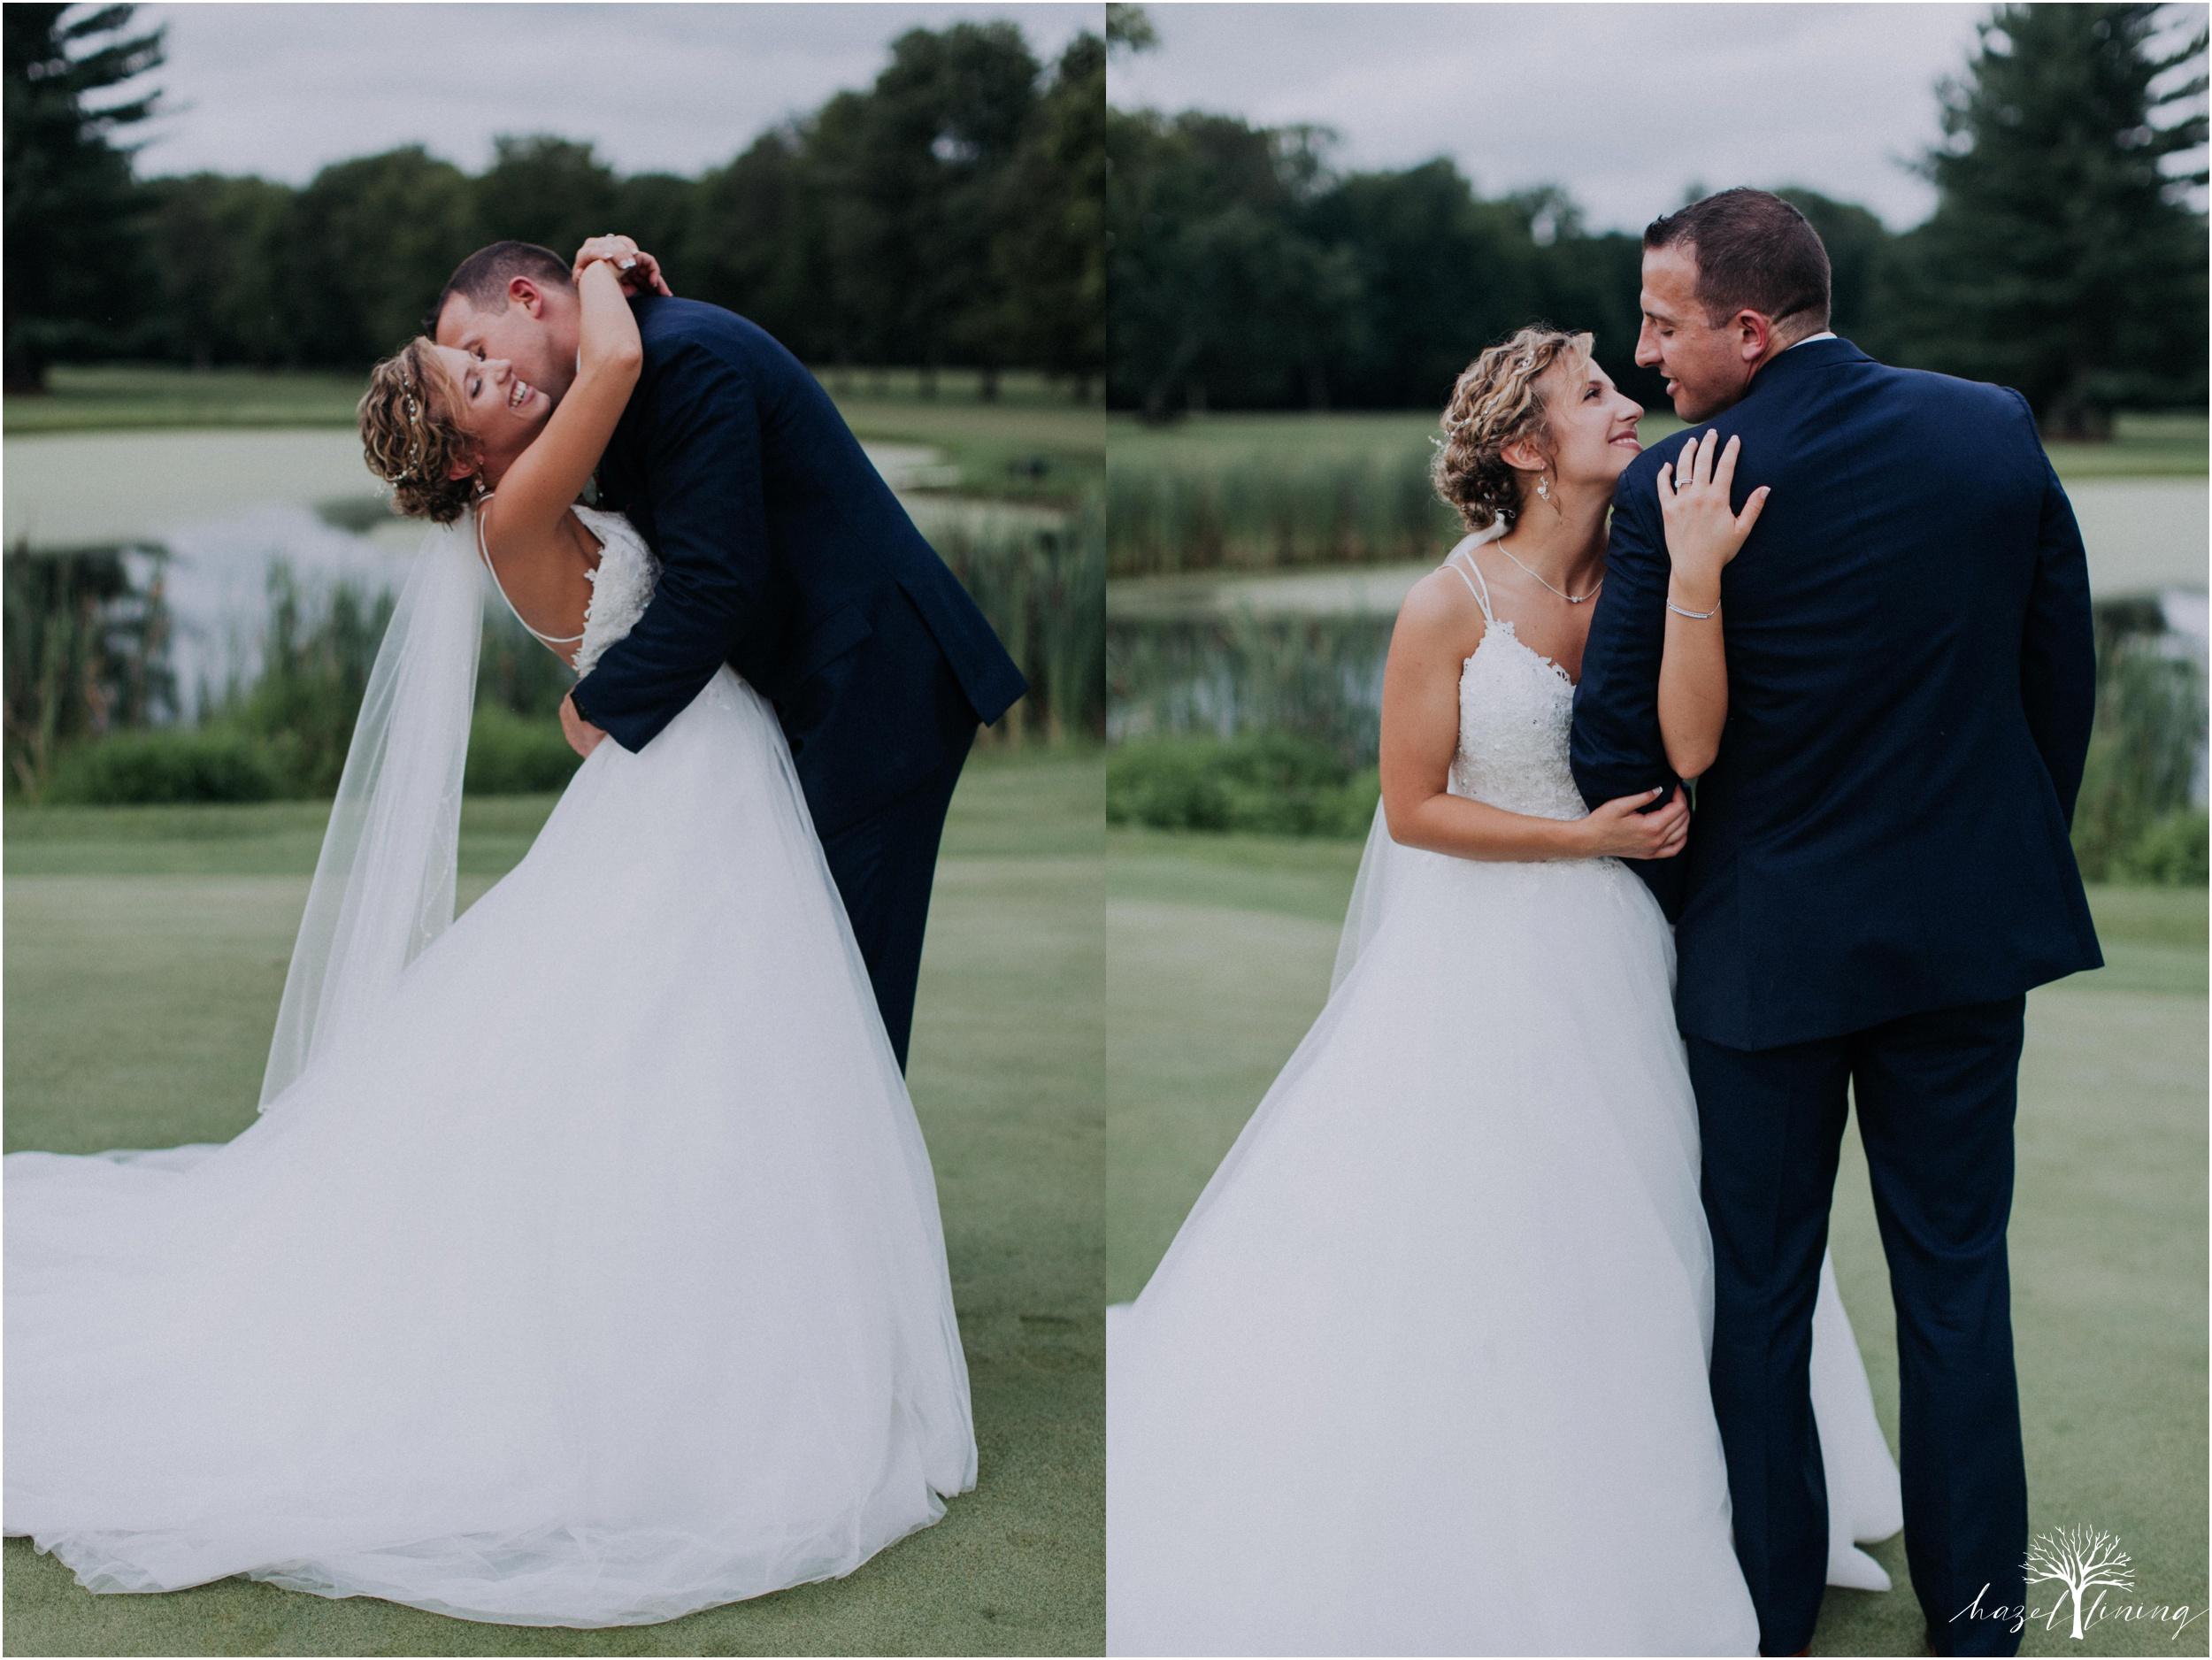 jonathan-weibel-becky-haywood-loft-at-sweetwater-cc-pennsburg-pennsylvania-rainy-day-summer-wedding-hazel-lining-travel-wedding-elopement-photography_0092.jpg